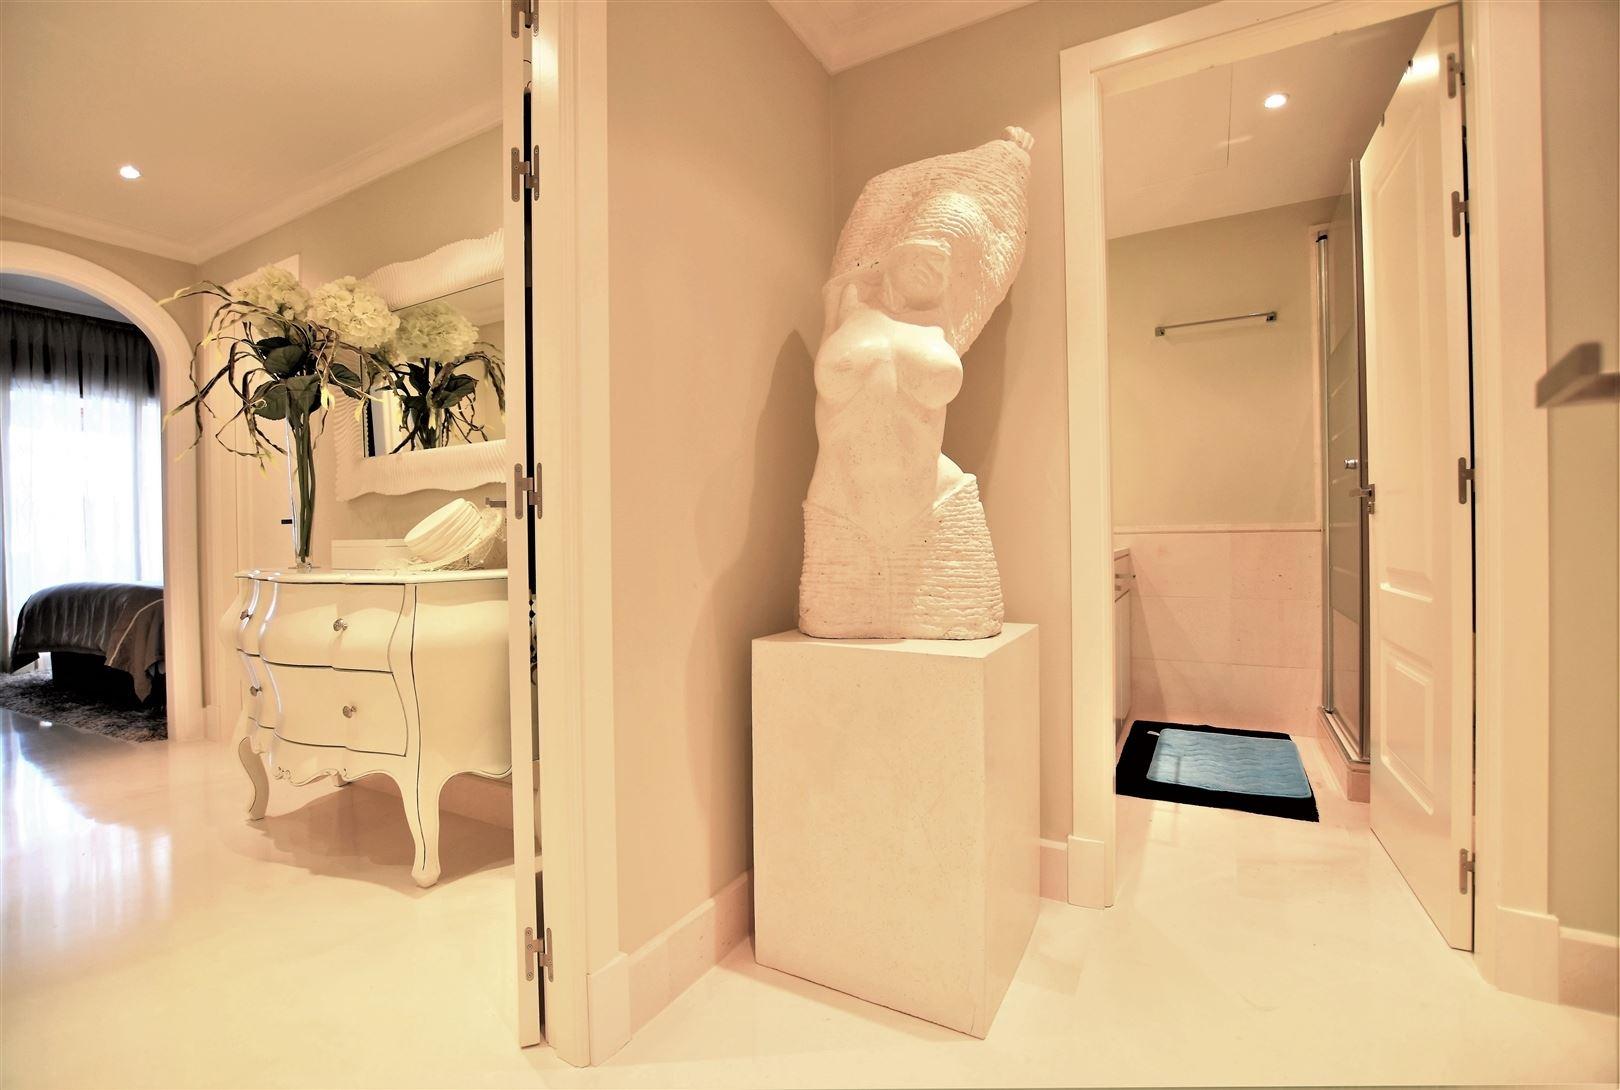 Foto 20 : Appartement te 29679 MARBELLA (Spanje) - Prijs € 1.750